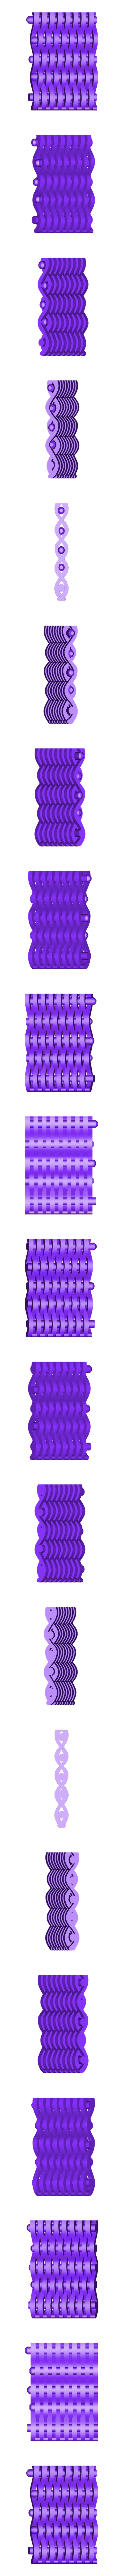 short_watt2.stl Download free STL file The Crannog • 3D printable template, Earsling